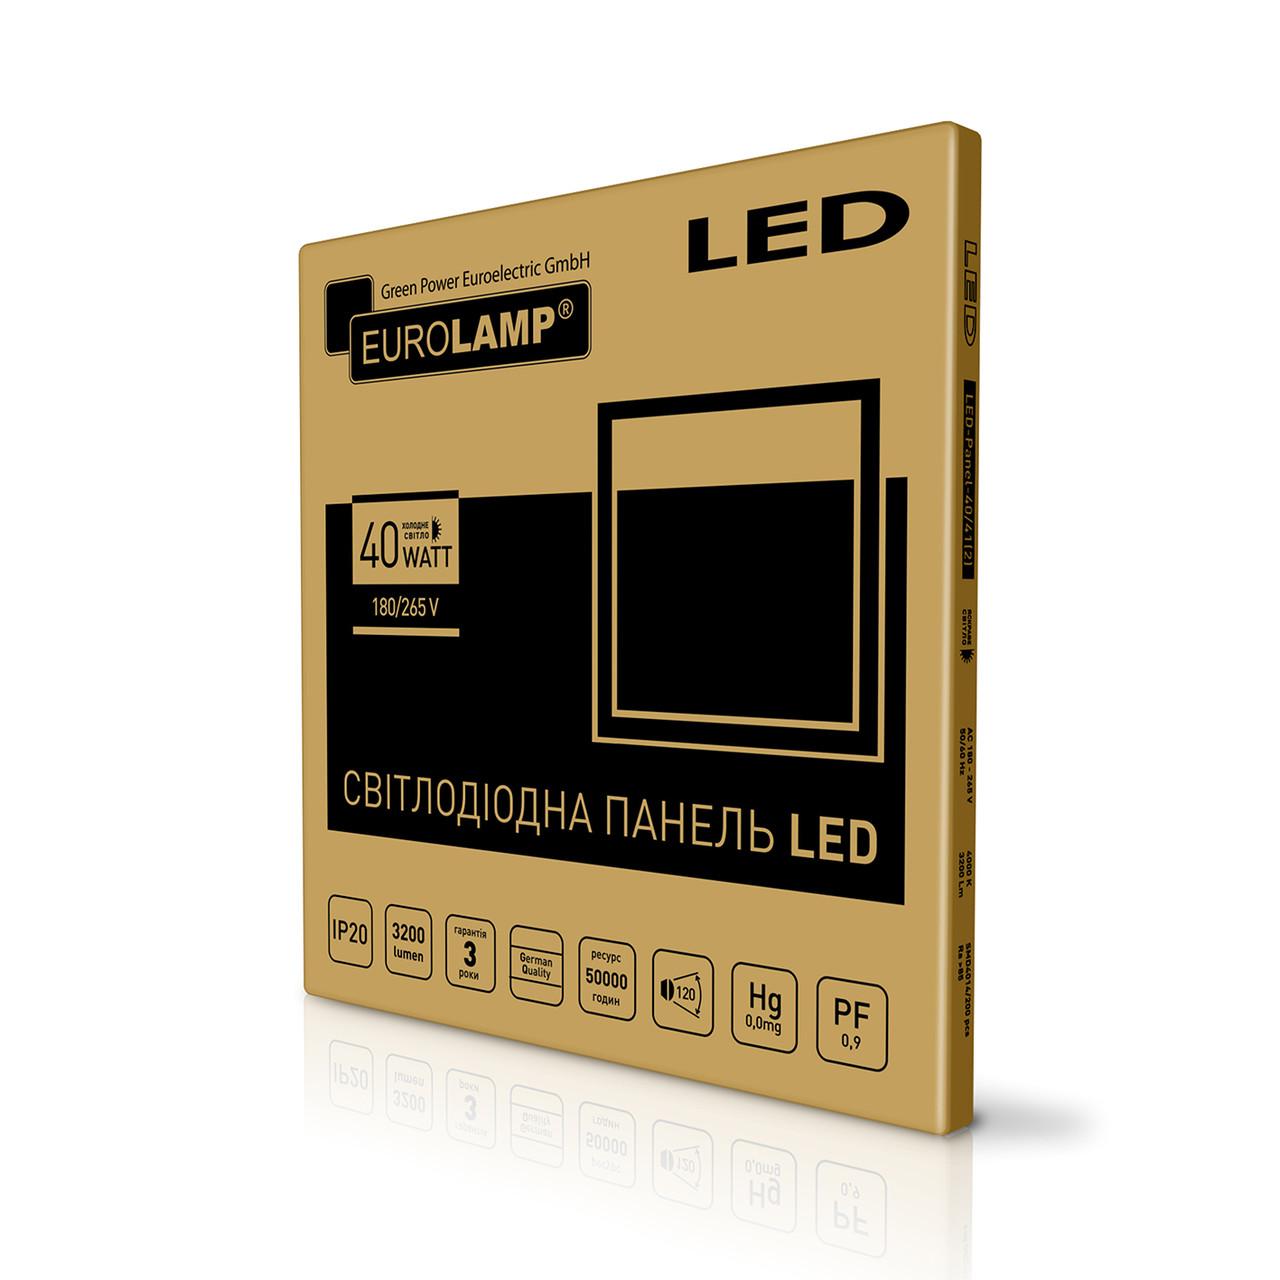 EUROLAMP LED Панель 60х60 белая рамка 40W 5500K 2in1